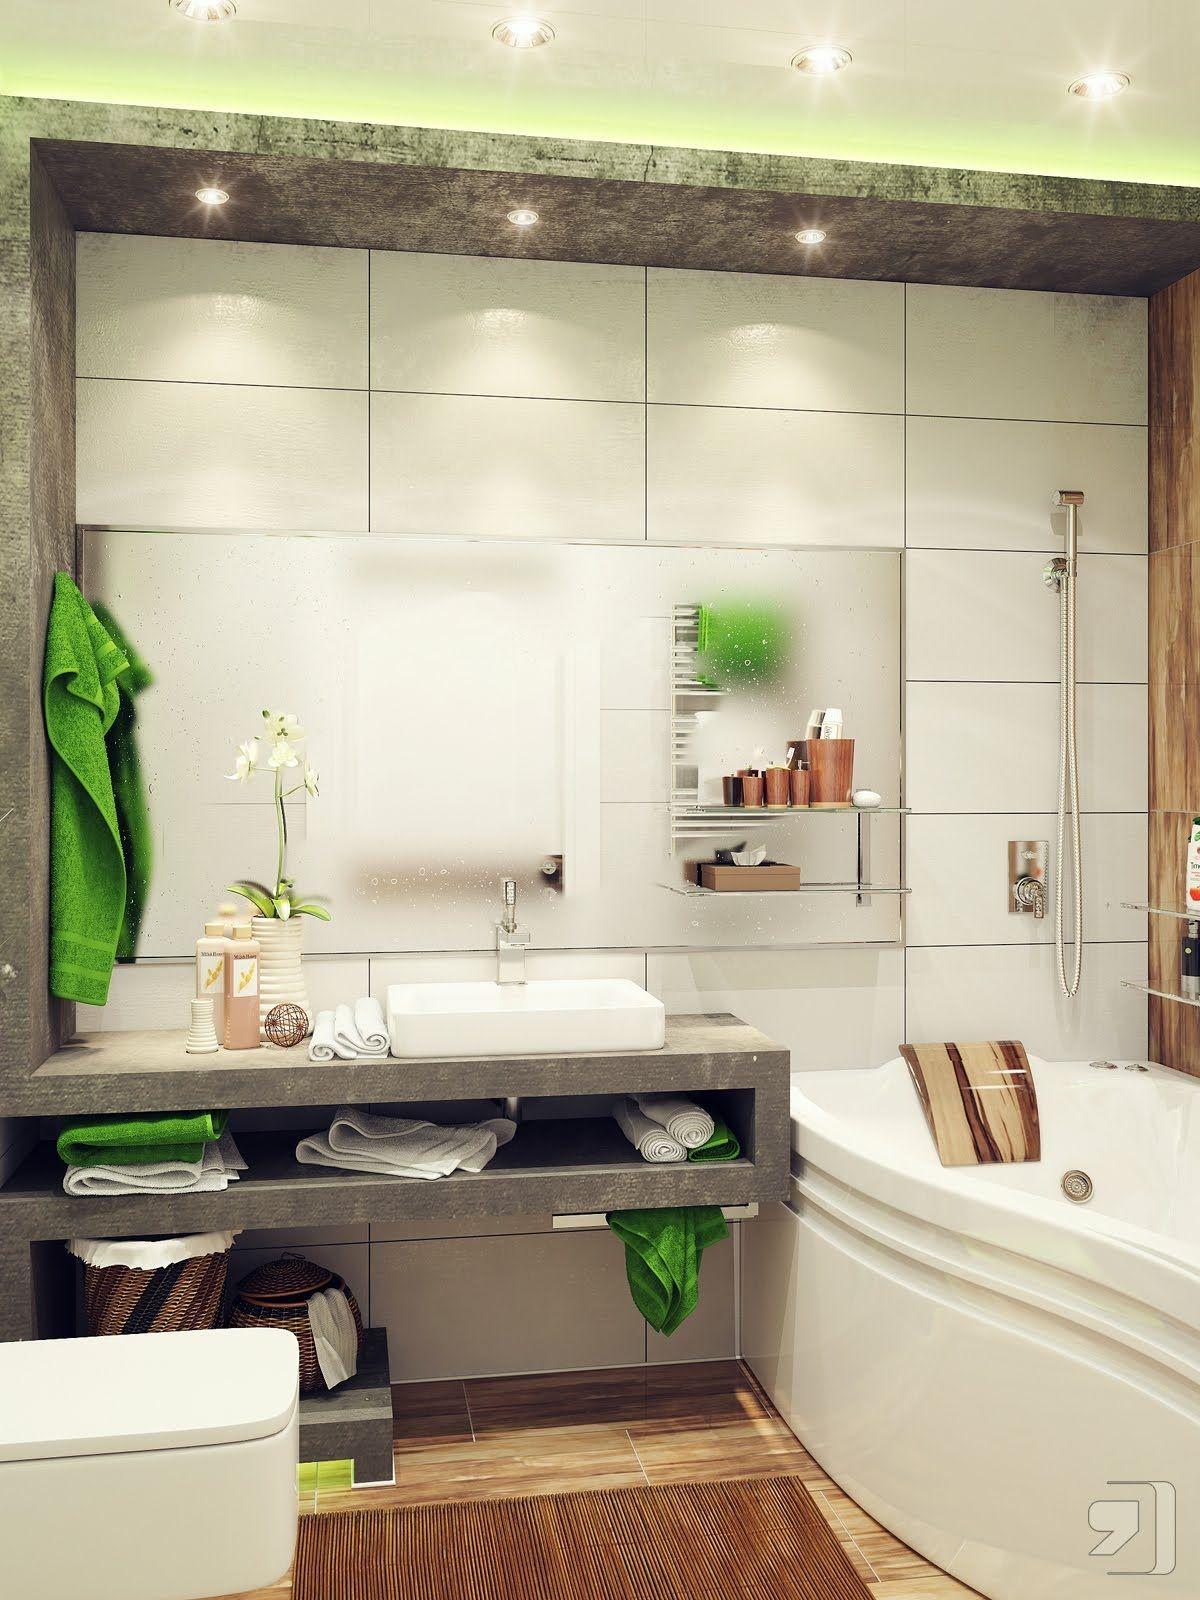 20 Beautiful Small Bathroom Ideas | Small bathroom, Small bathroom ...